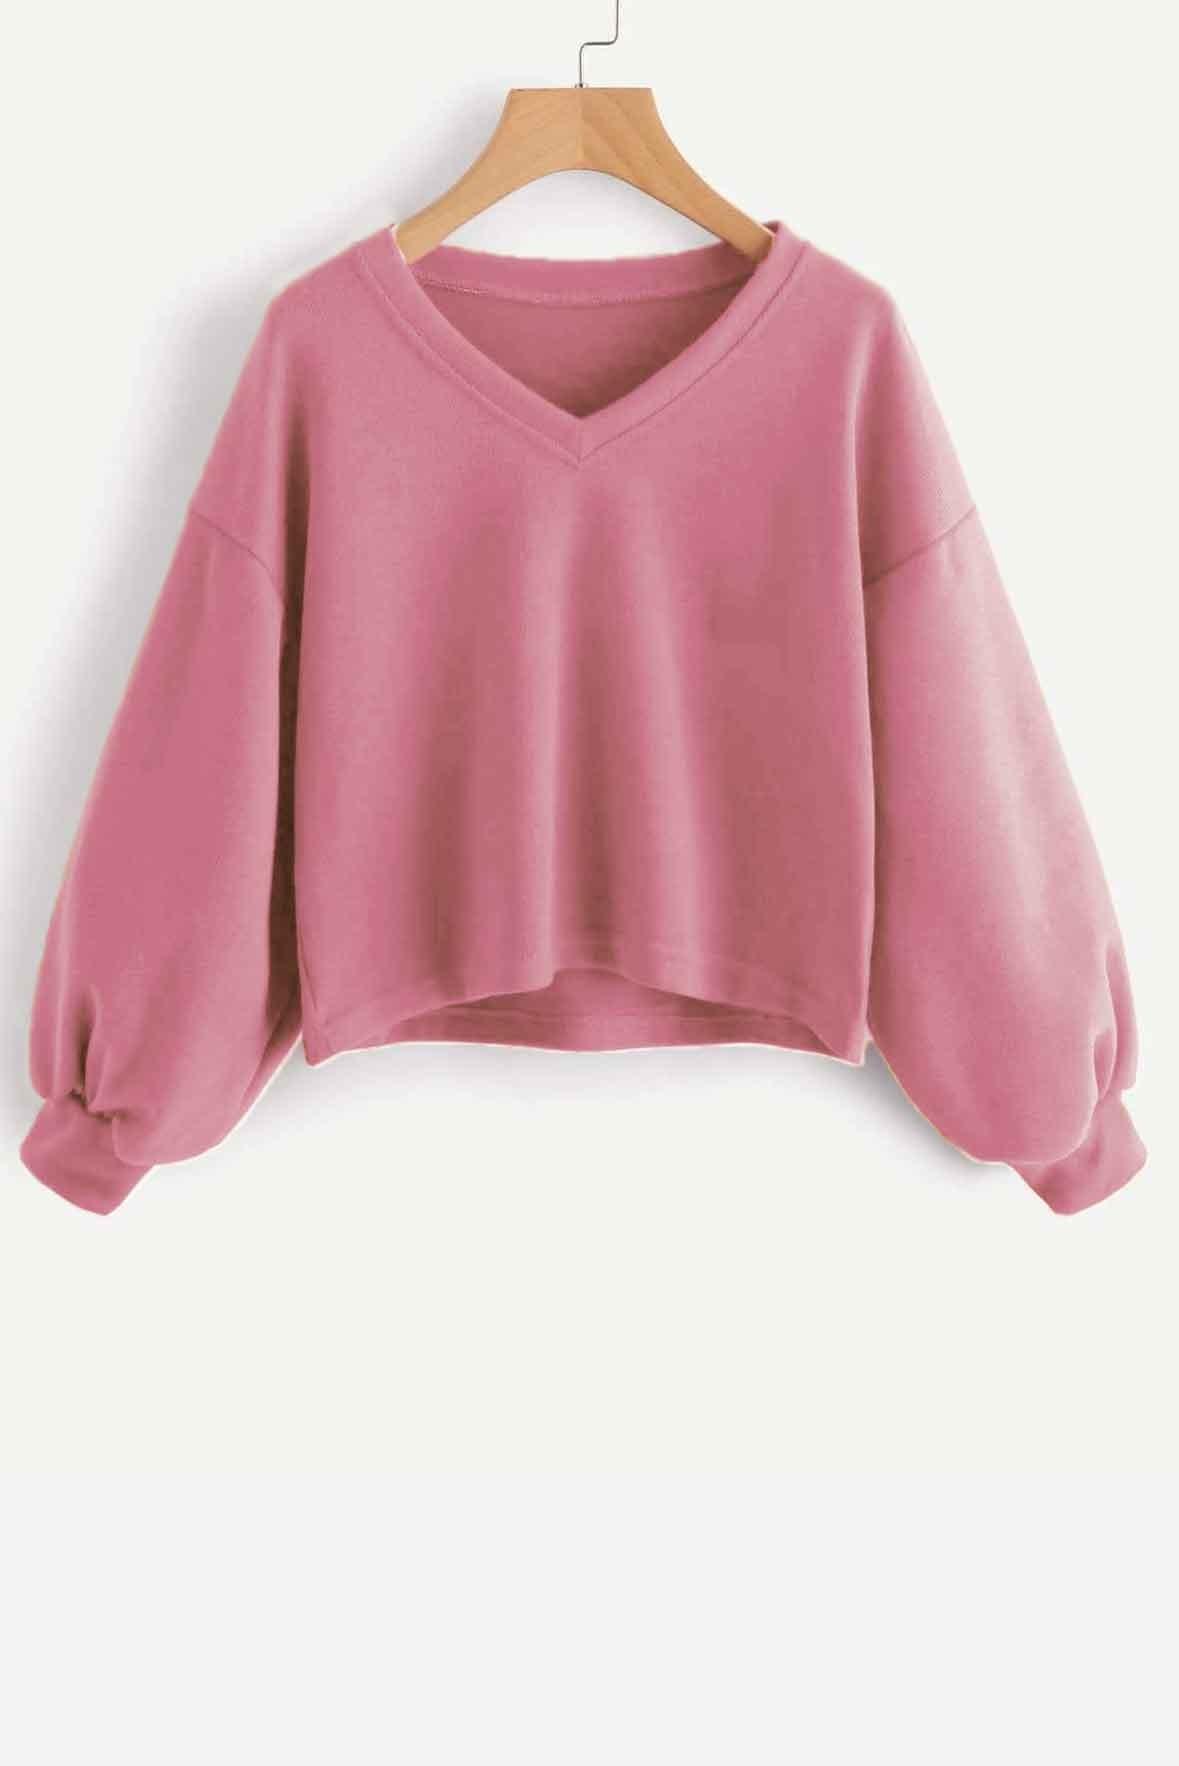 Solid Casual V neck Lantern Sleeve Sweatshirt Pink